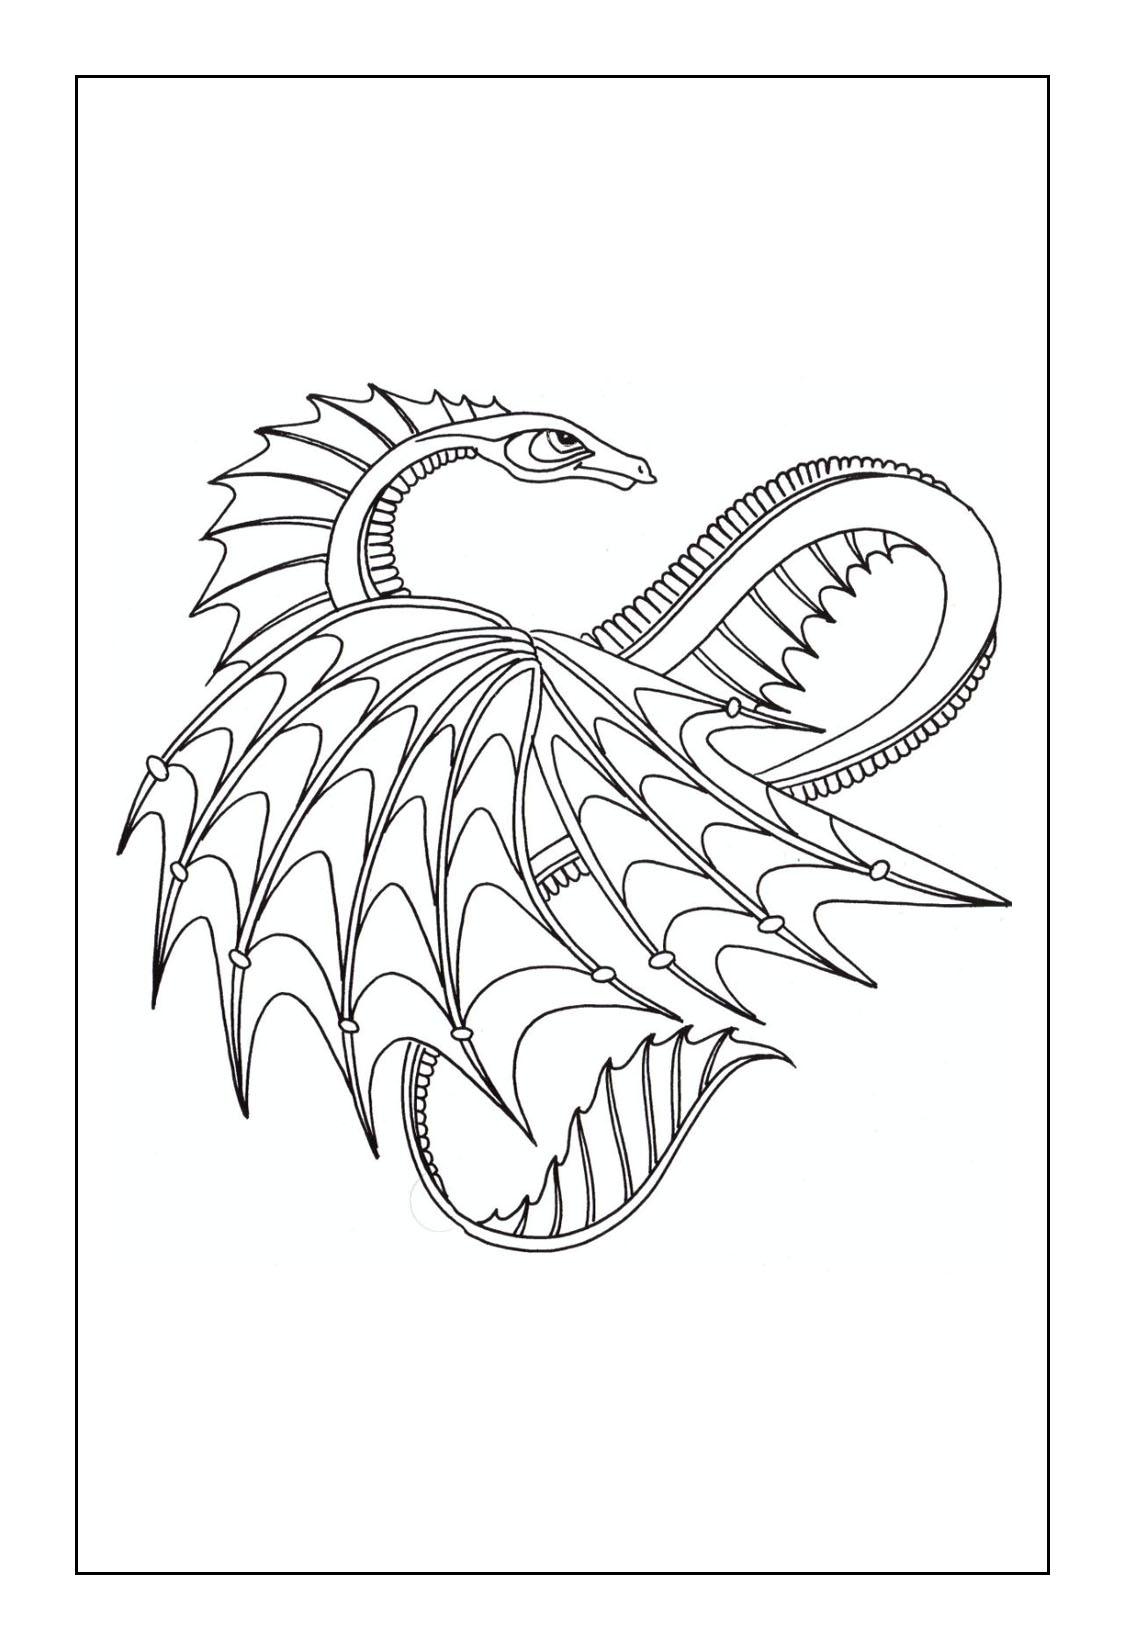 Dragon Coloring Pages coloringrocks